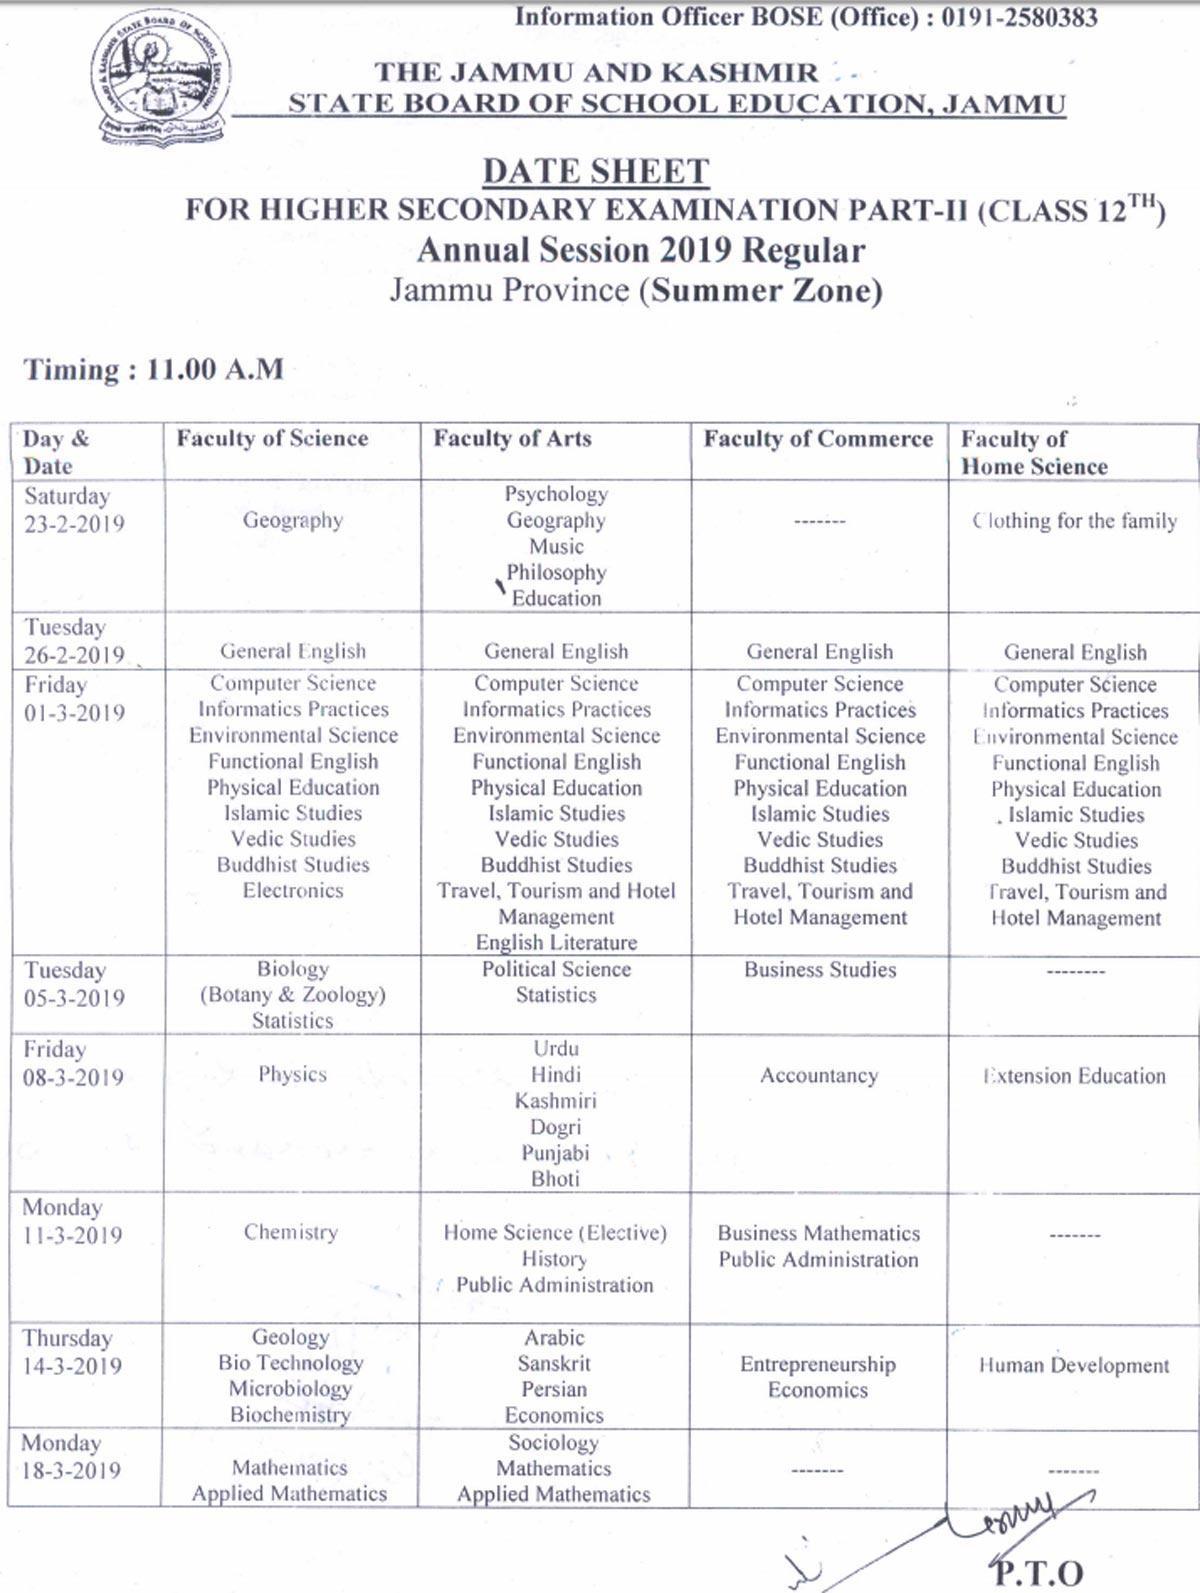 JKBOSE revised datesheet for Jammu division class 12 exam 2019